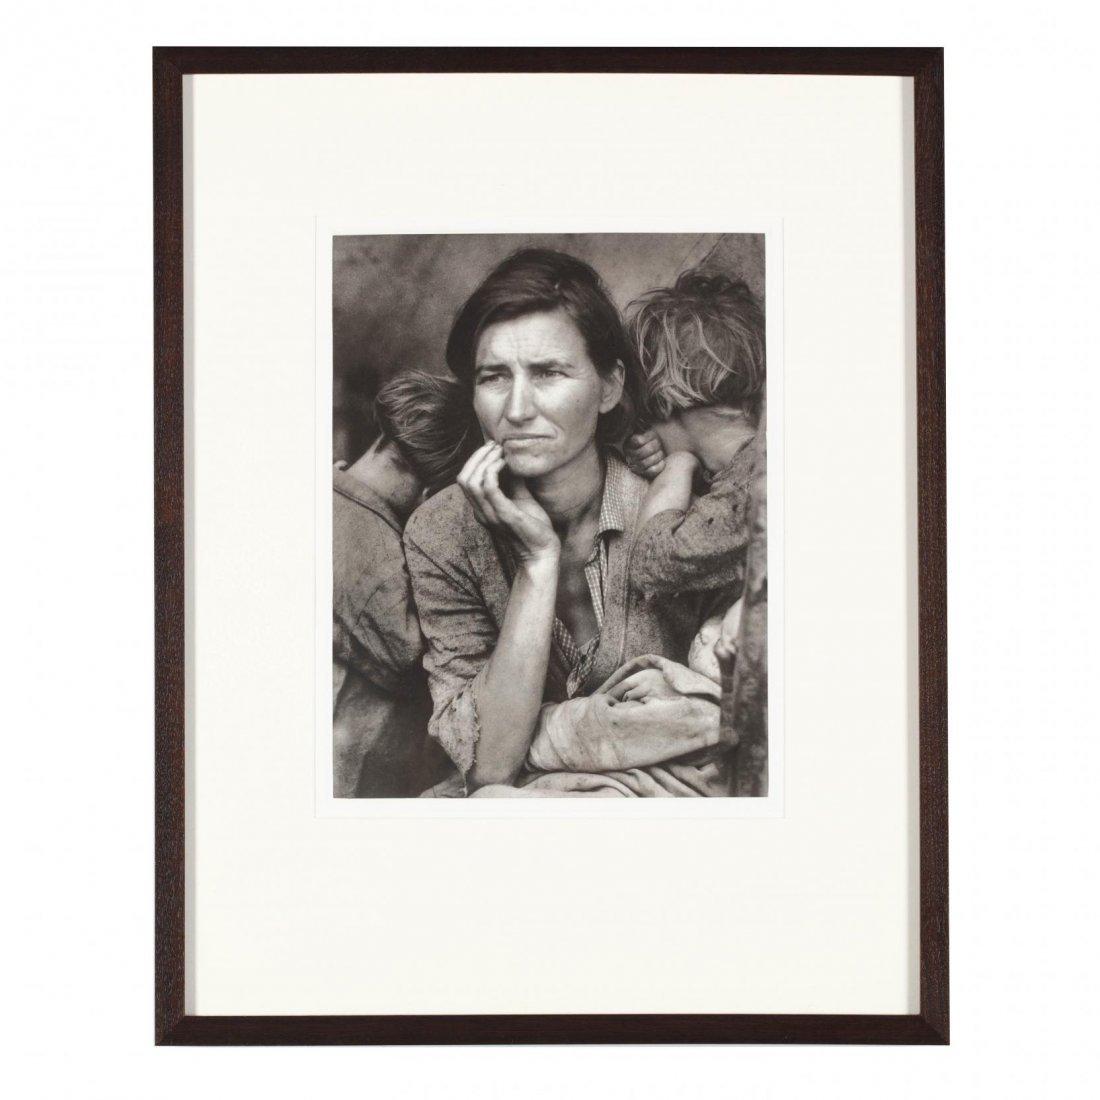 Dorothea Lange (1895-1965),  Migrant Mother, Nipomo,